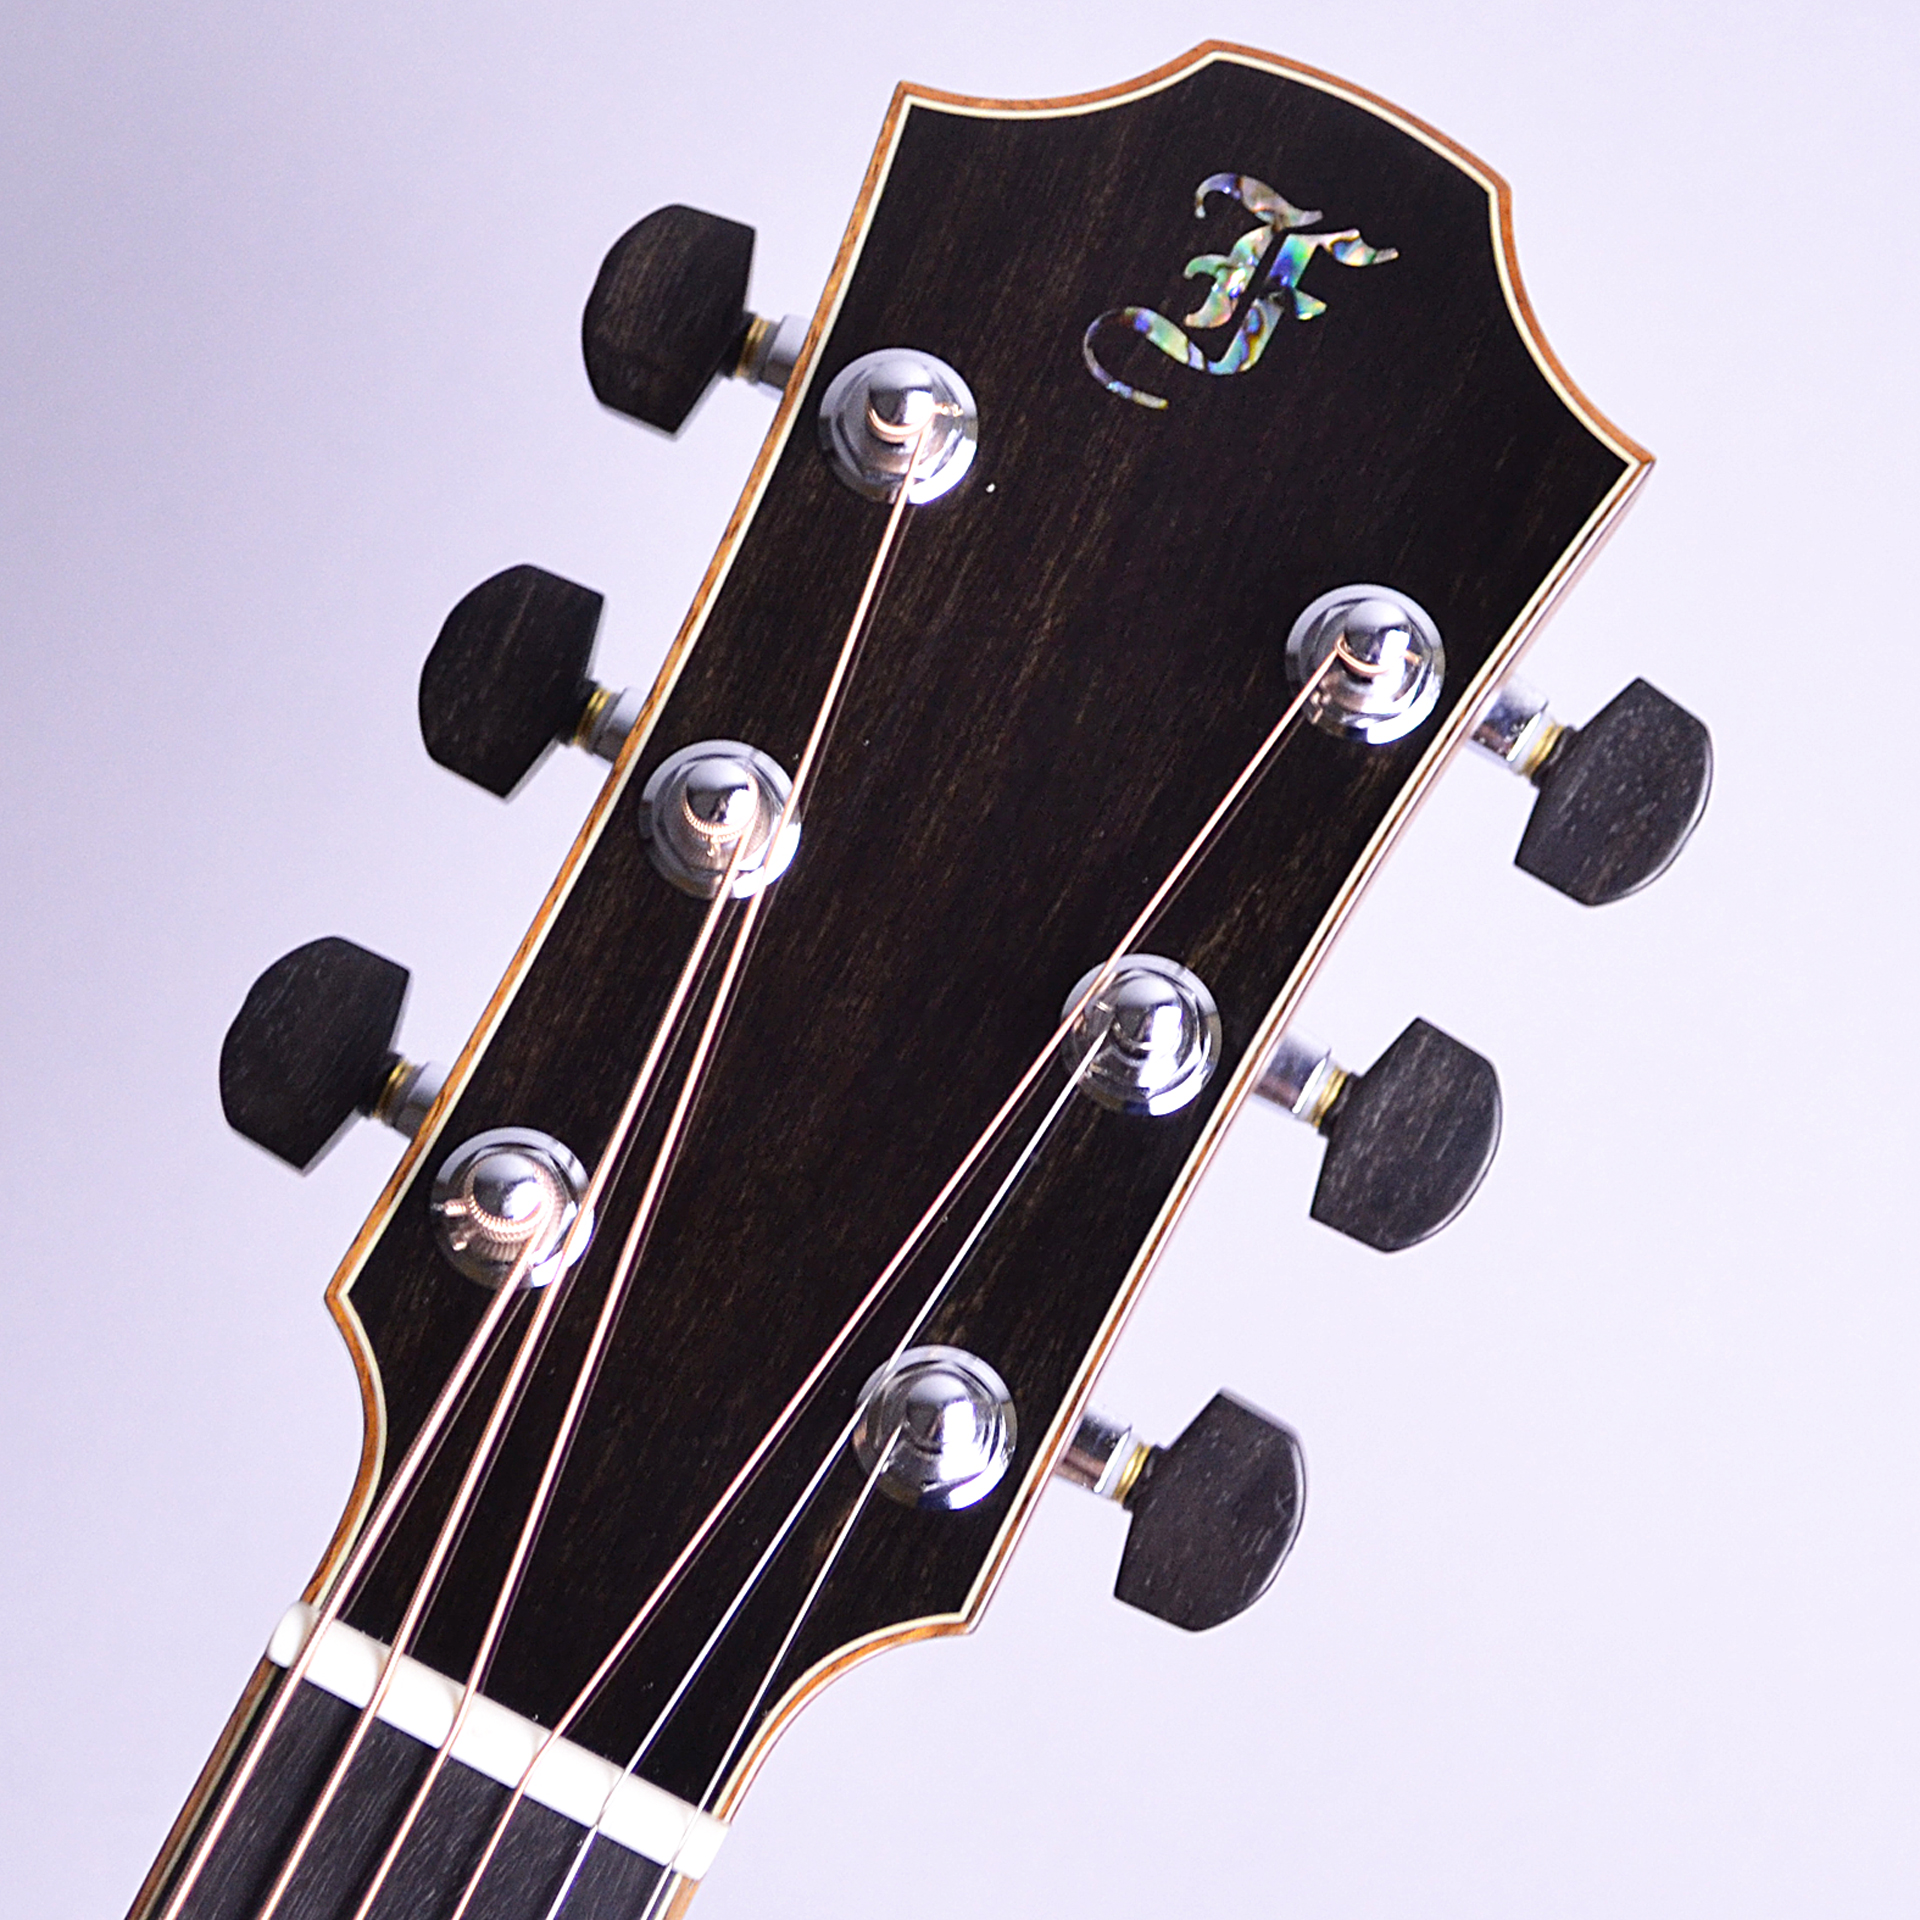 G27-SRCT Customのヘッド裏-アップ画像